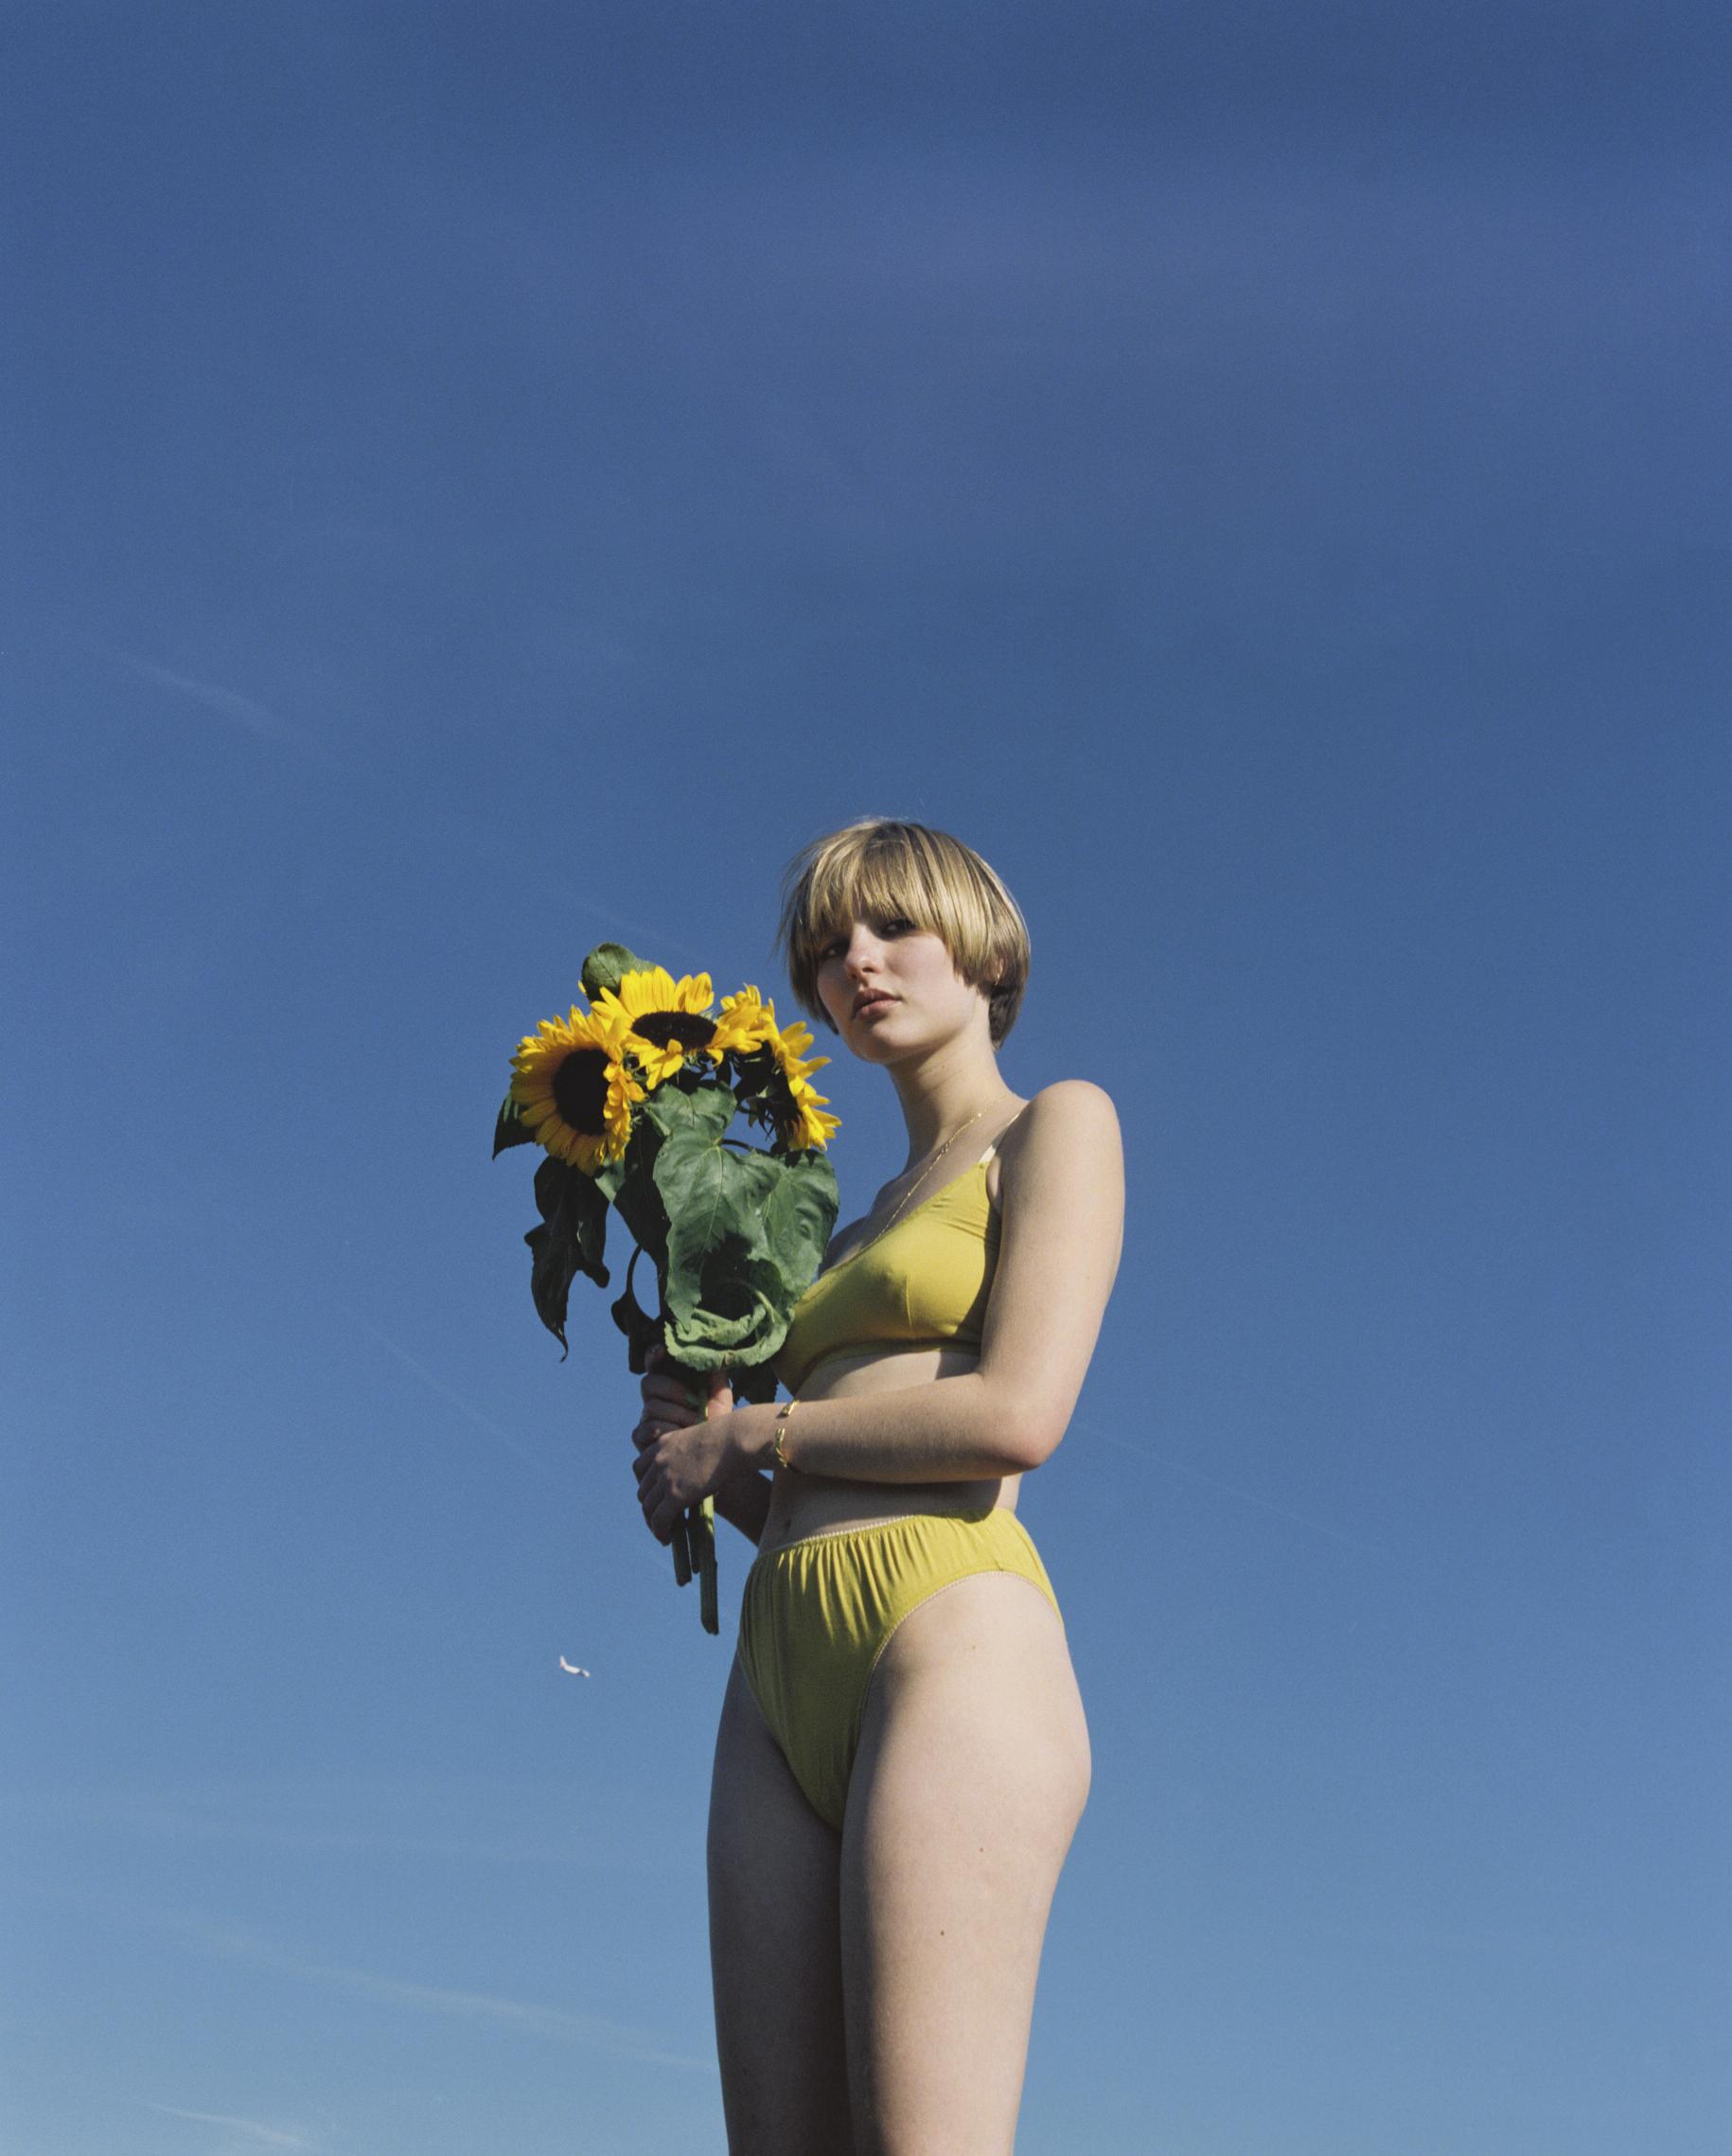 Blue Skies Sylvie for Jonesy